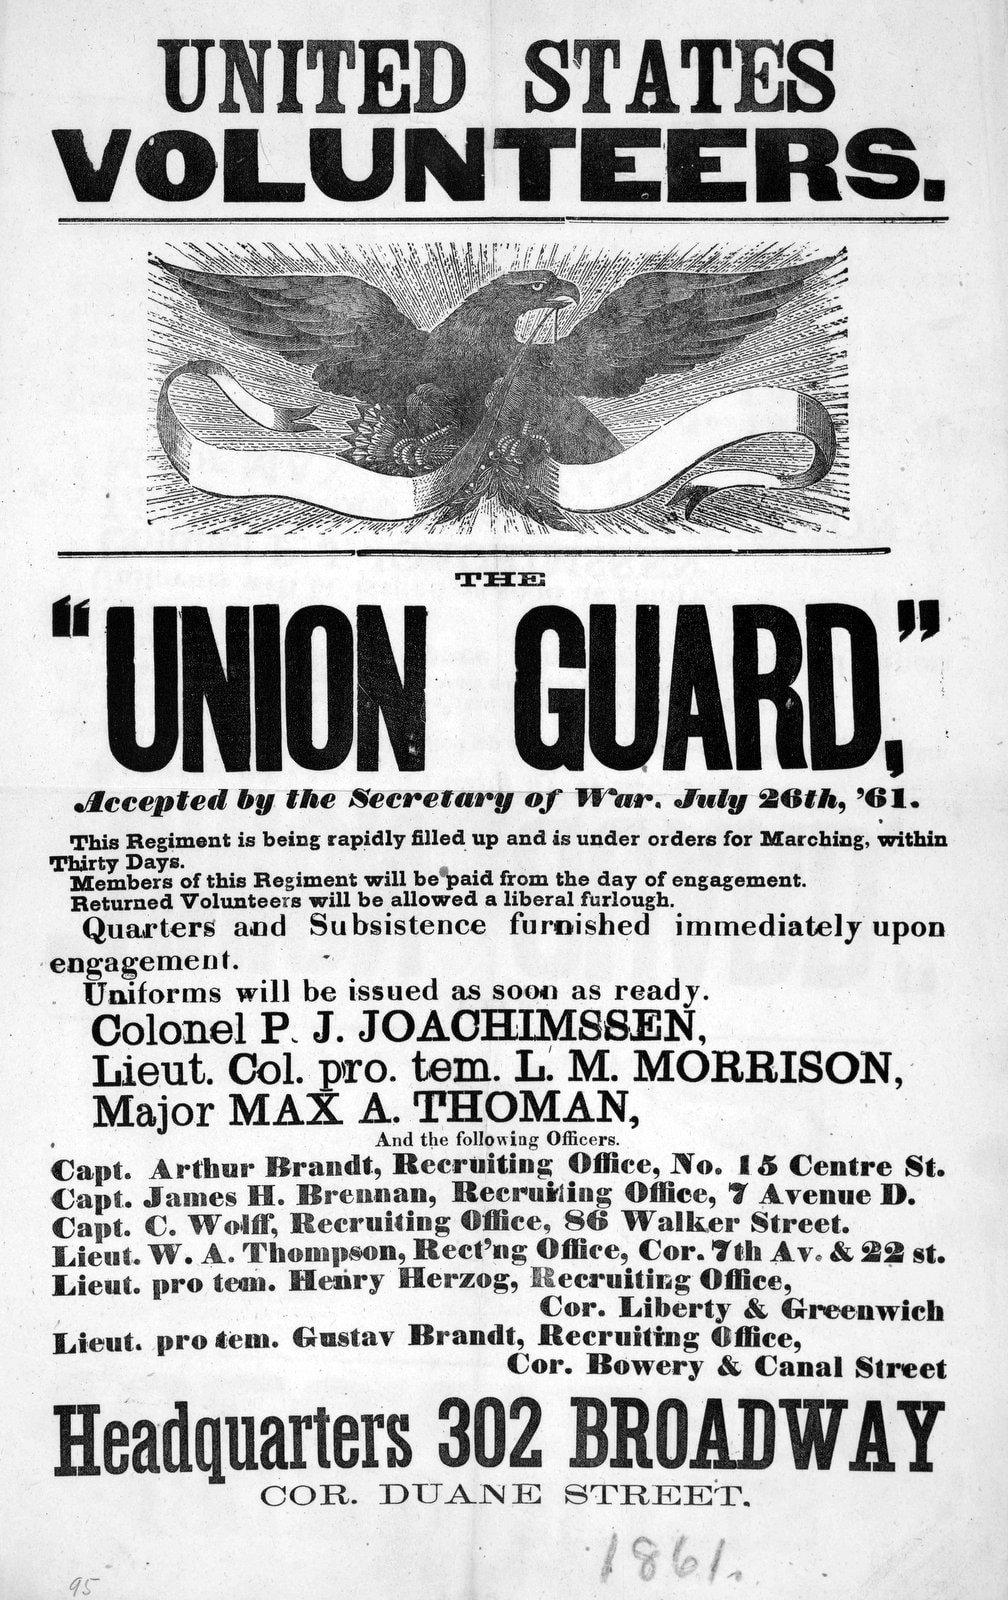 United States volunteers - Union Guard